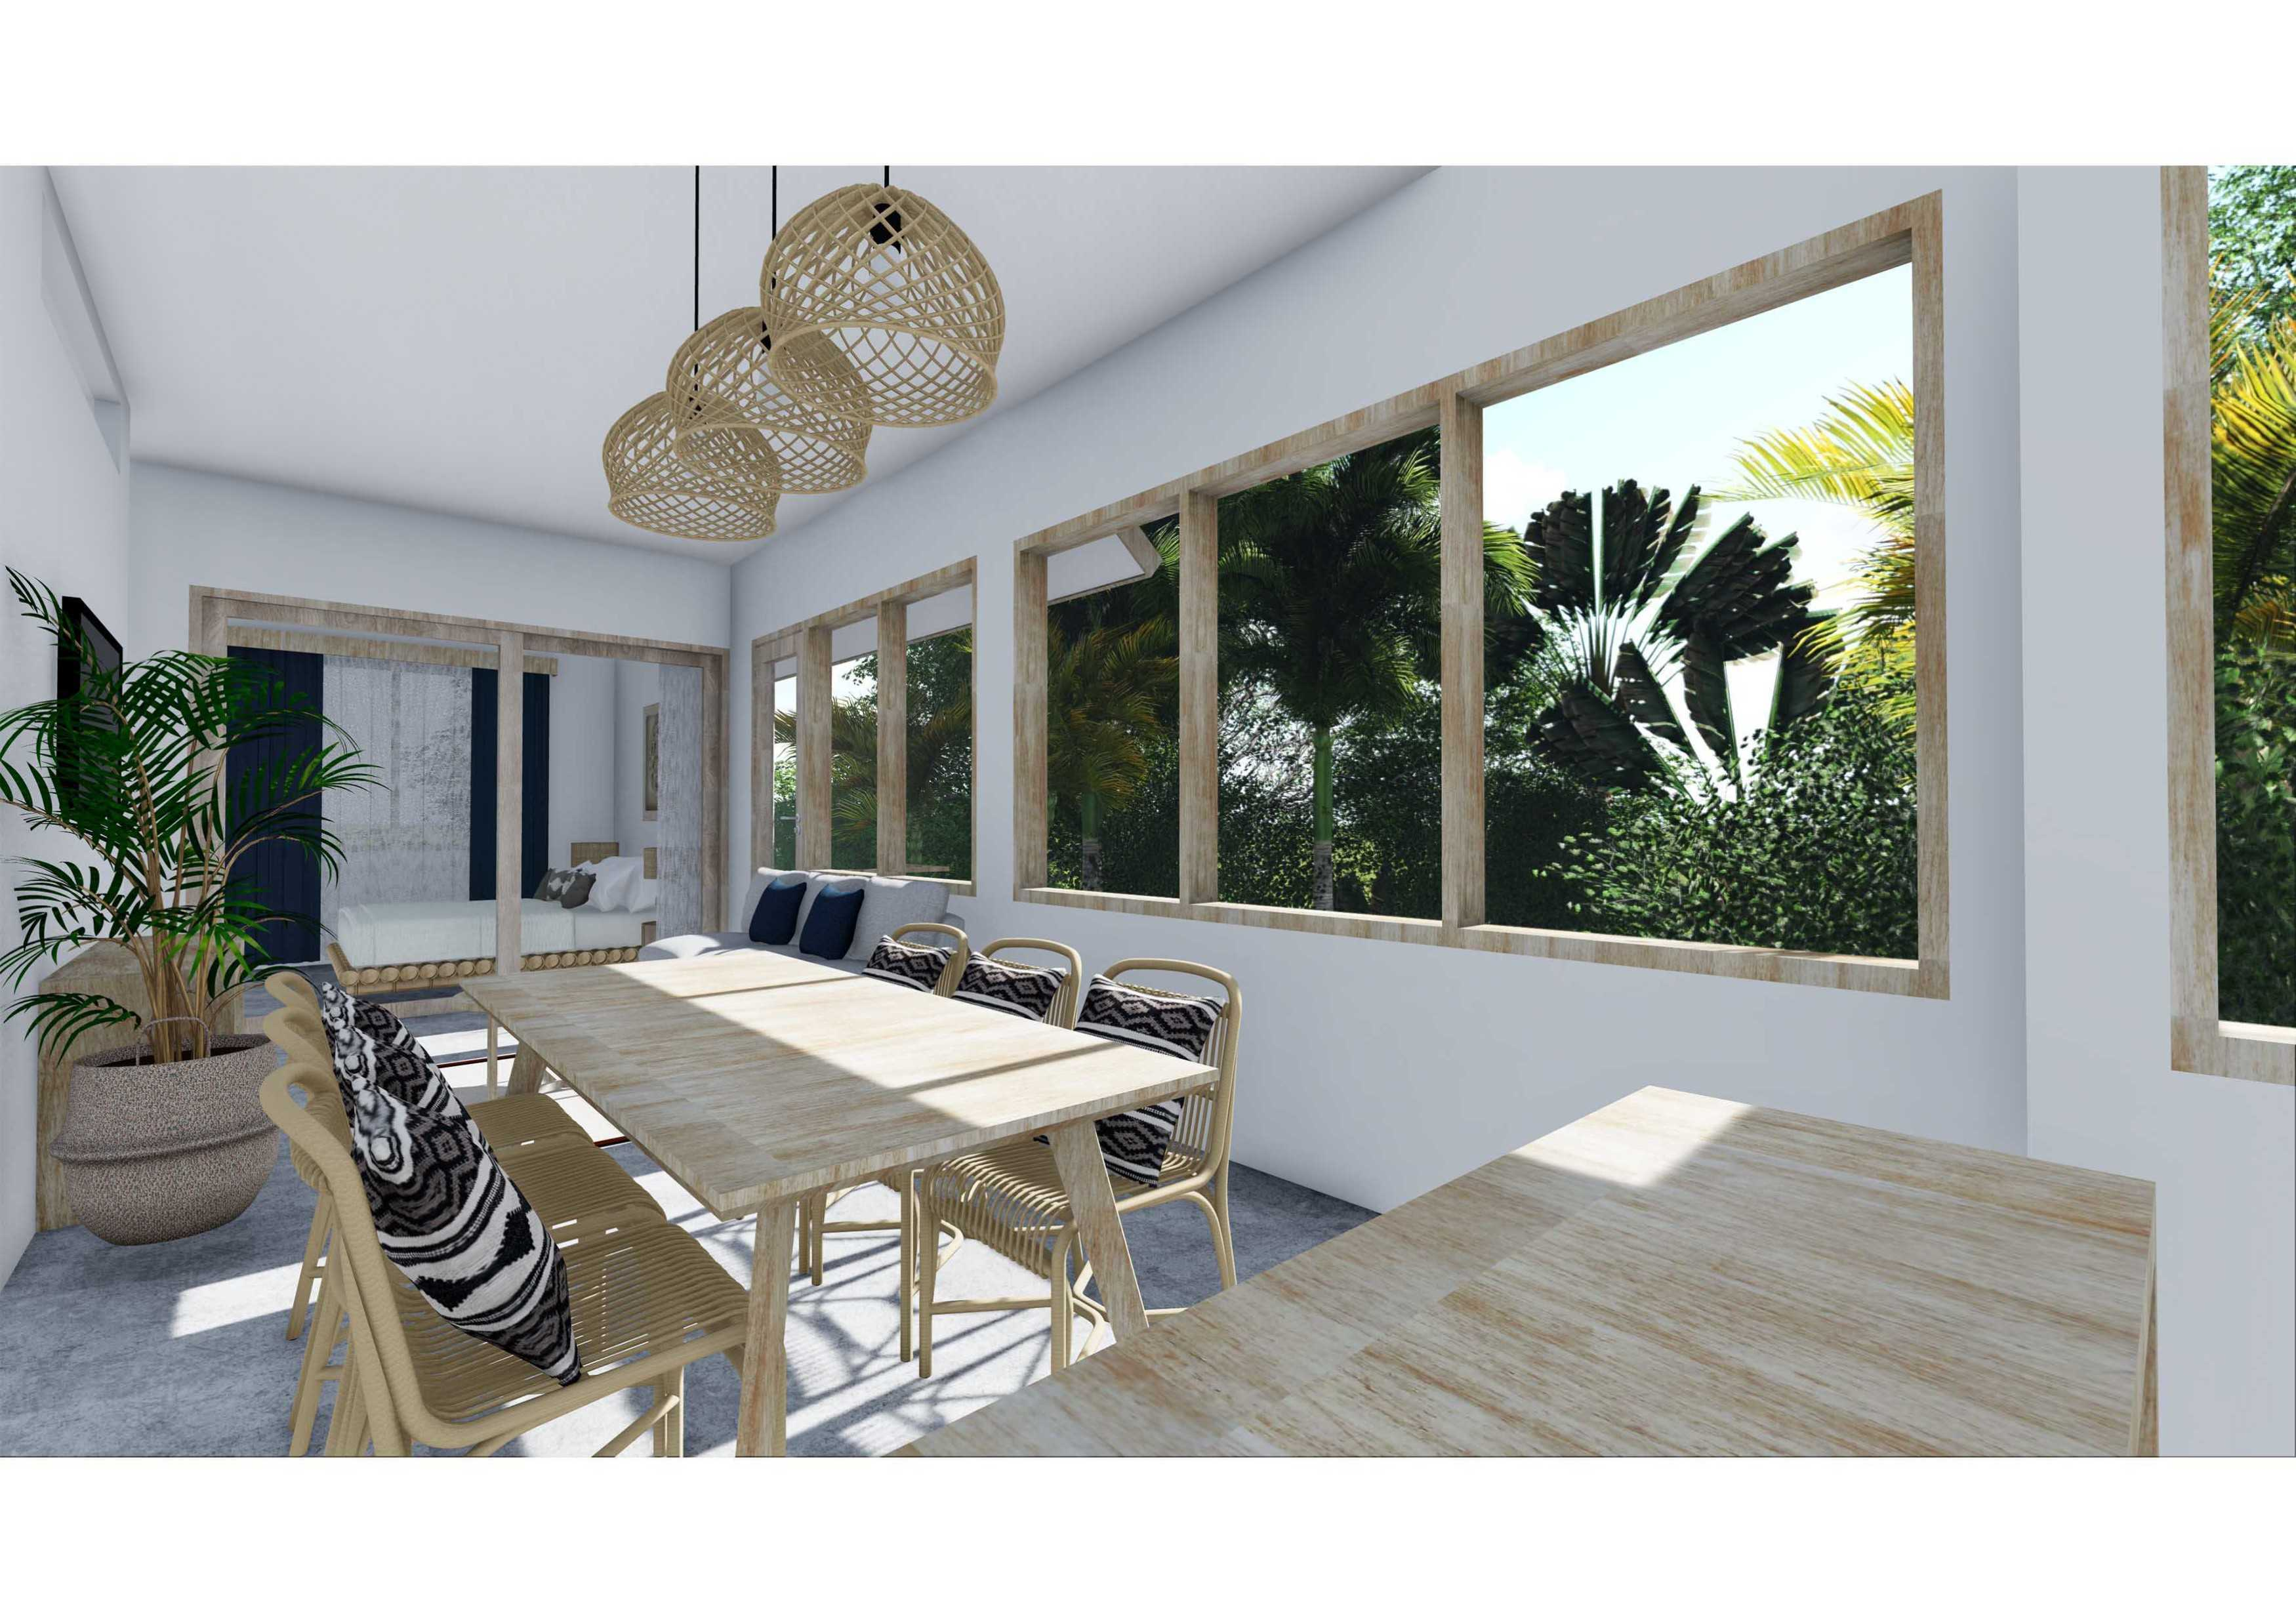 Revan Teggar Bamboo Blue Villa Bali, Indonesia Bali, Indonesia 1 Bedroom Studio Contemporary  107271